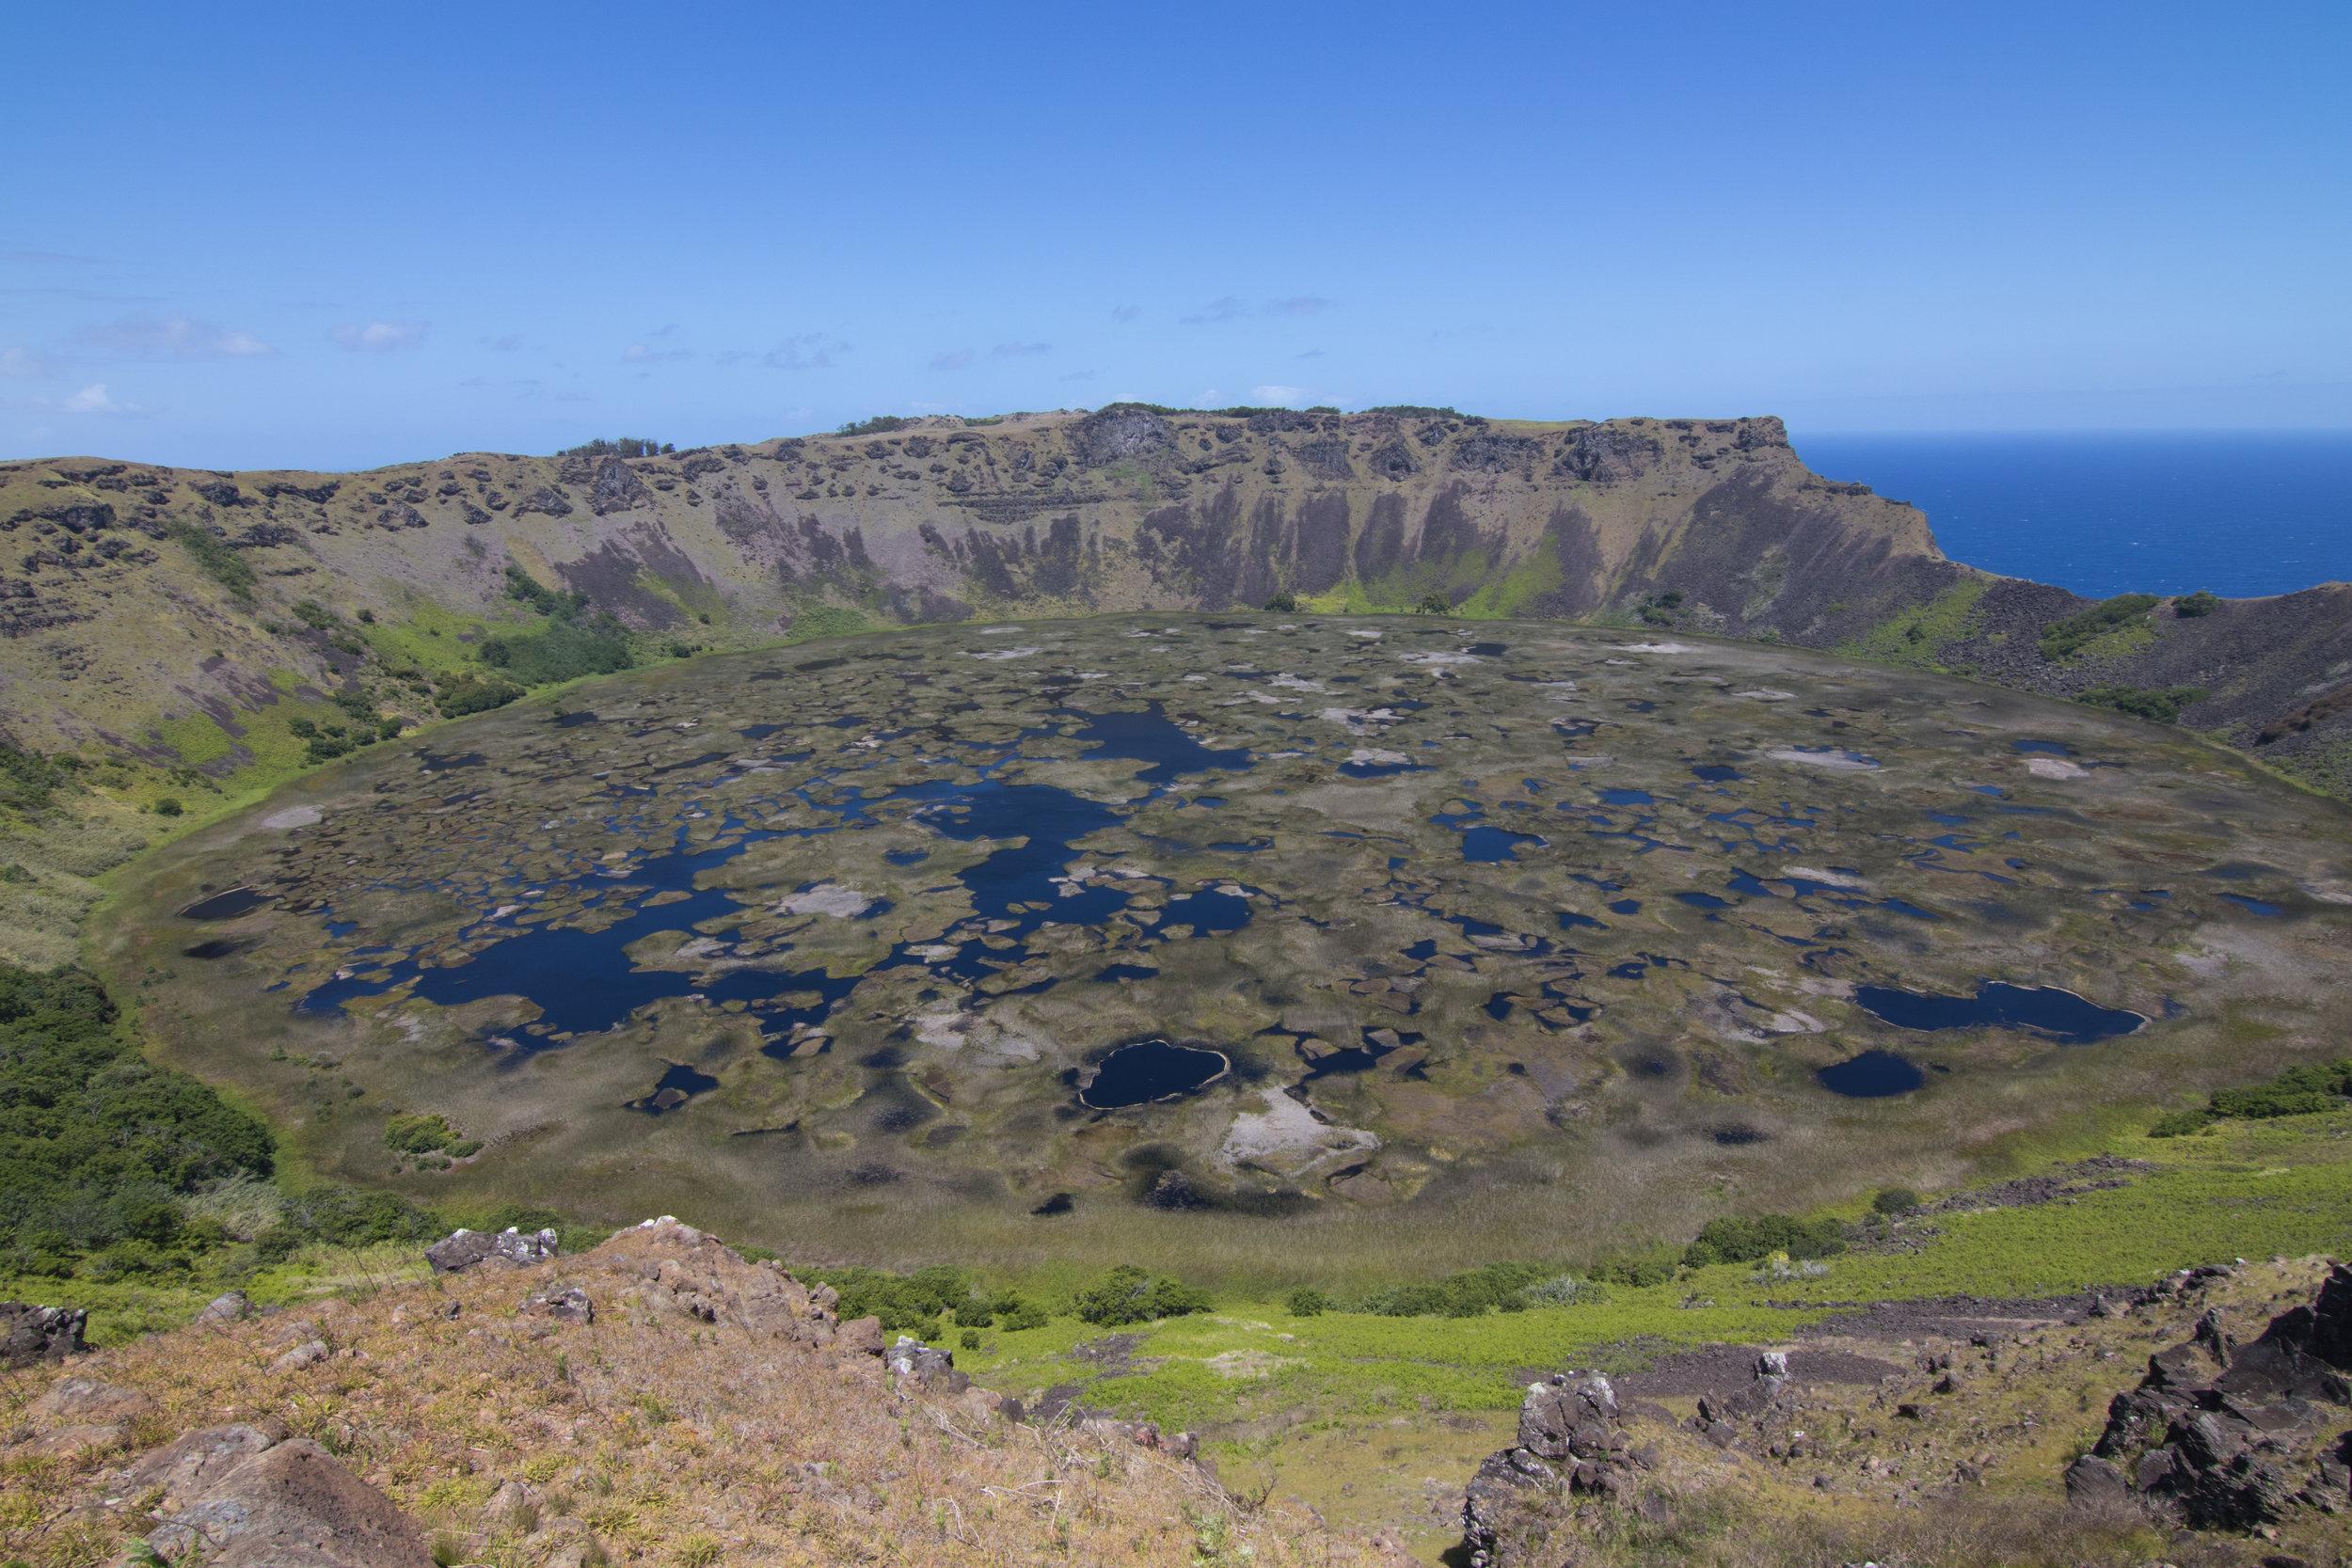 IMG_7836Easter Island 2.jpg